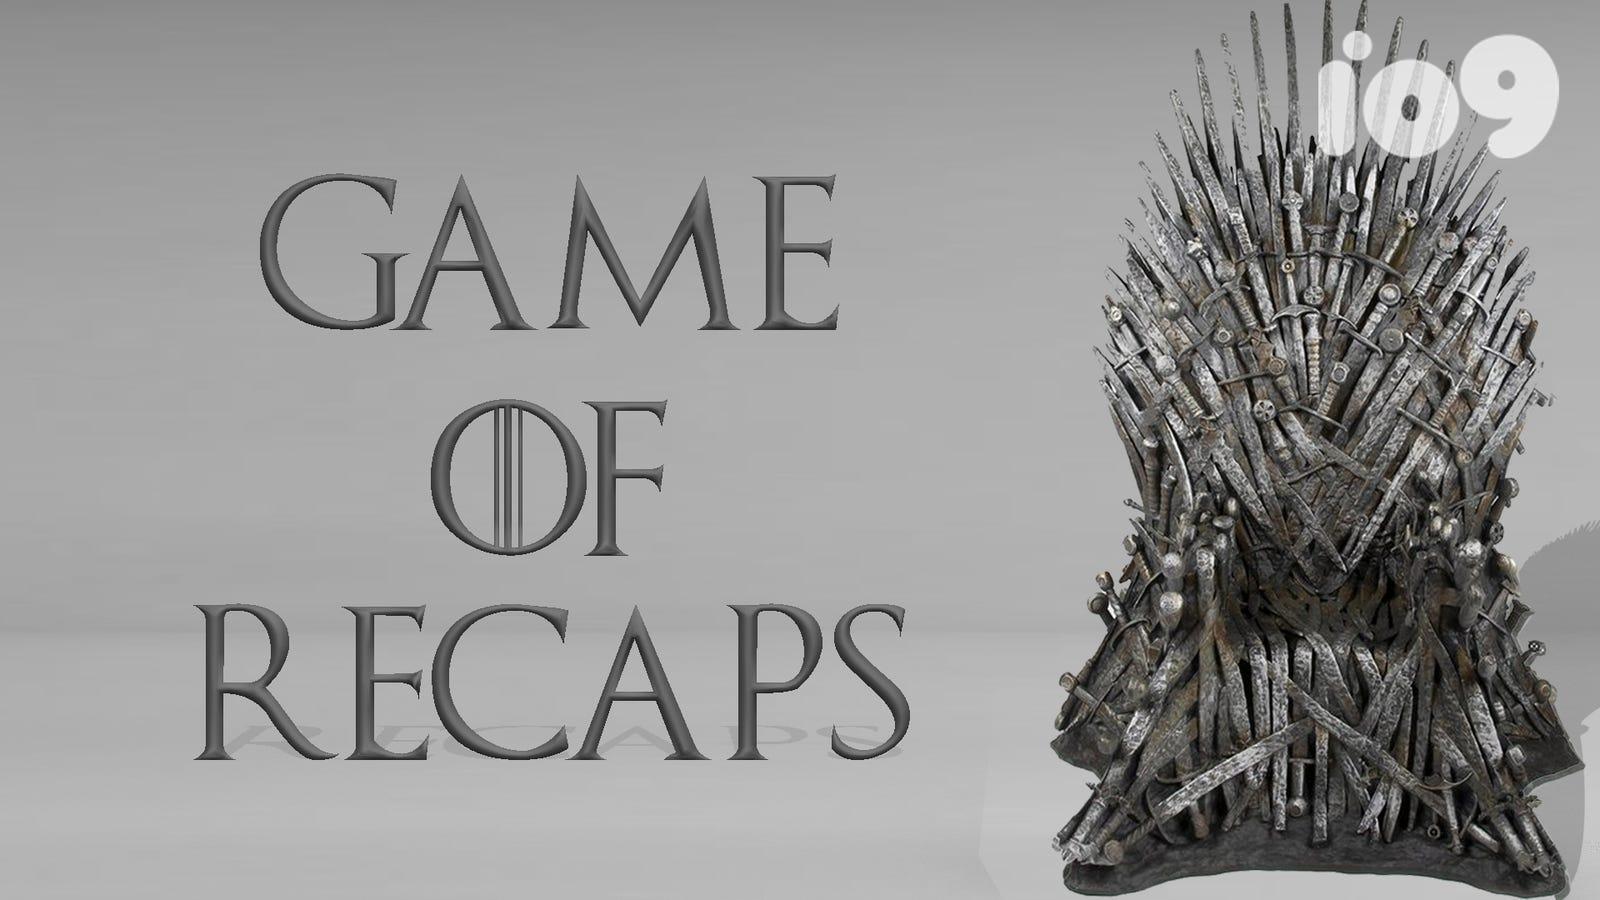 Complete Game of Thrones Season 1-7 Recap in Under 10 Minutes